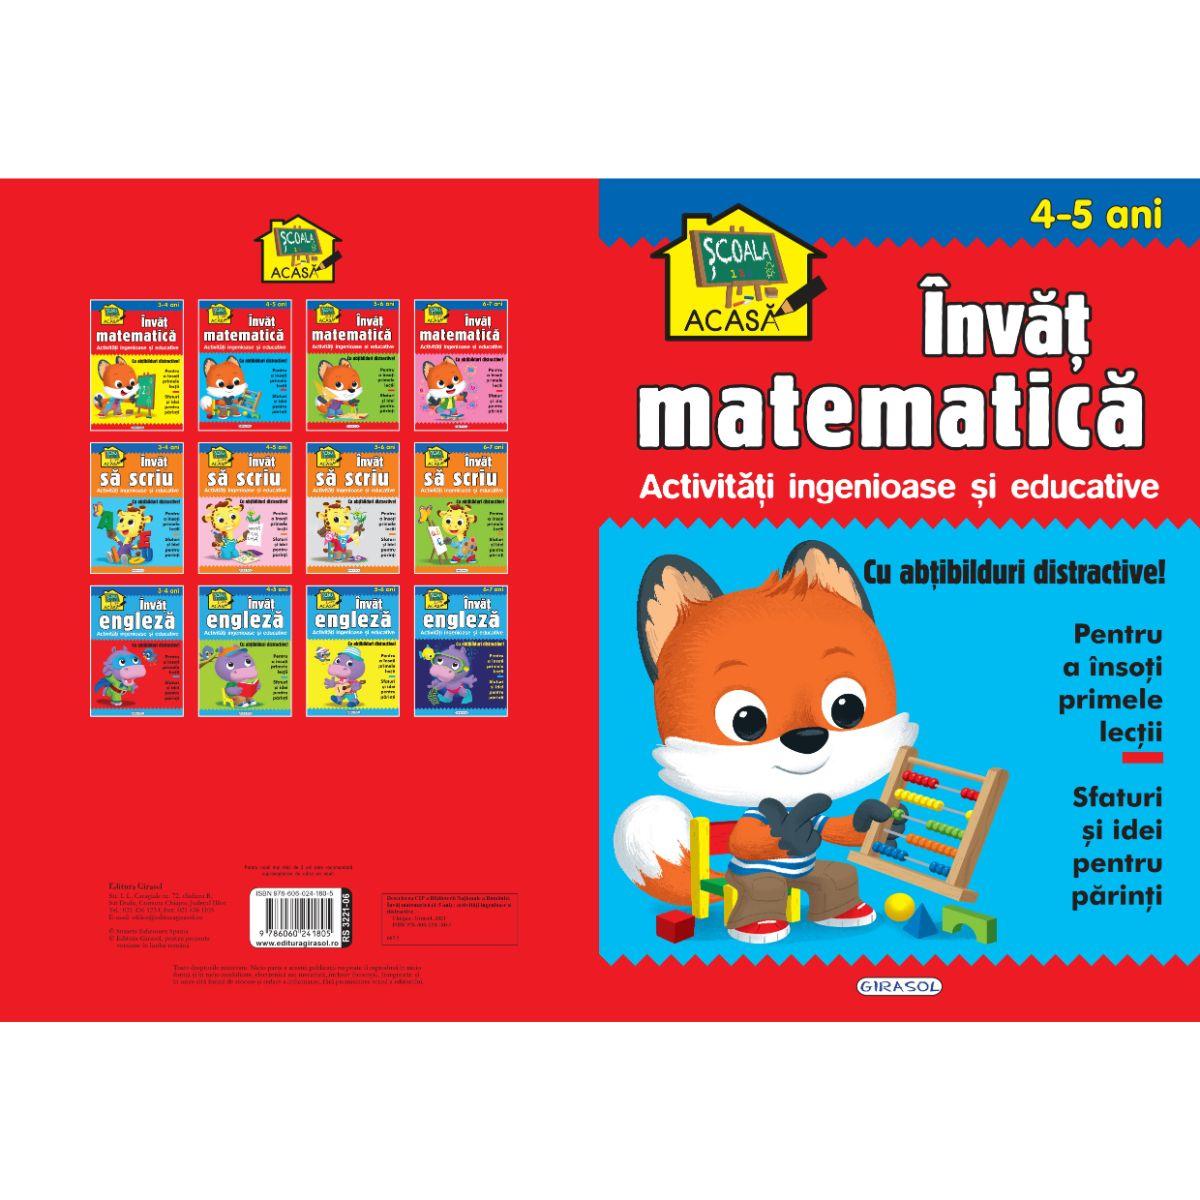 Scoala acasa, Invat matematica, 4-5 ani